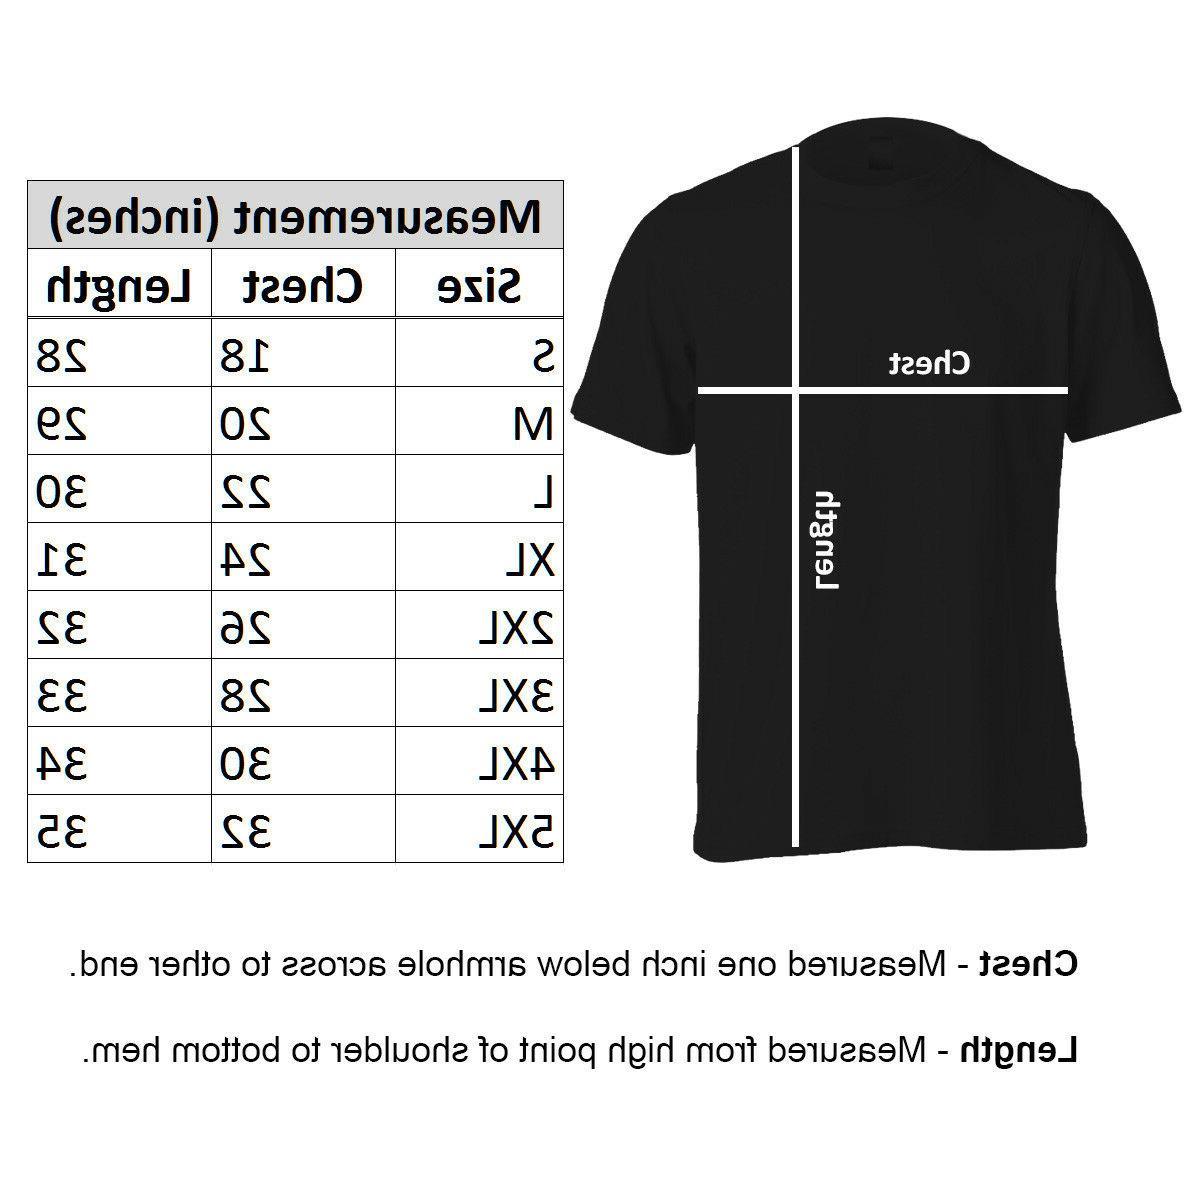 New T-Shirt - NFL Shirt for